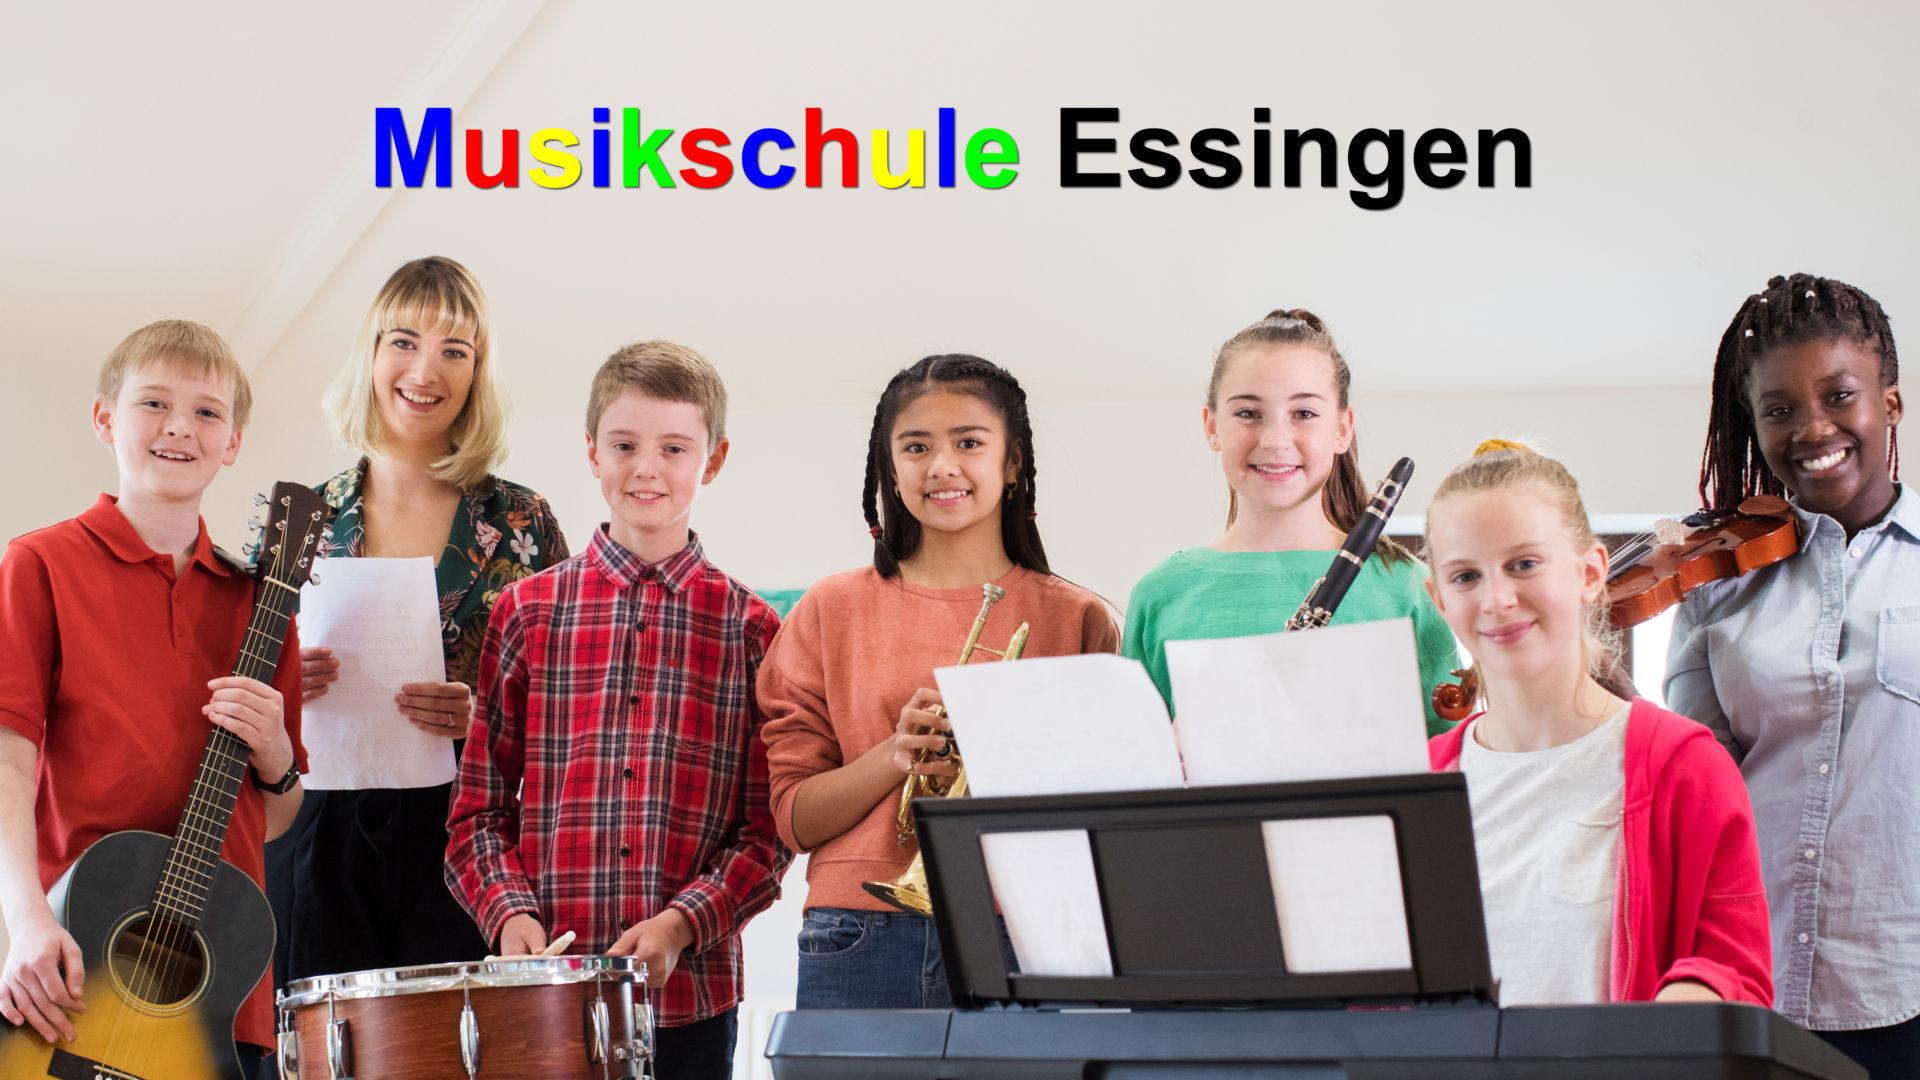 musikschule 76879 essingen